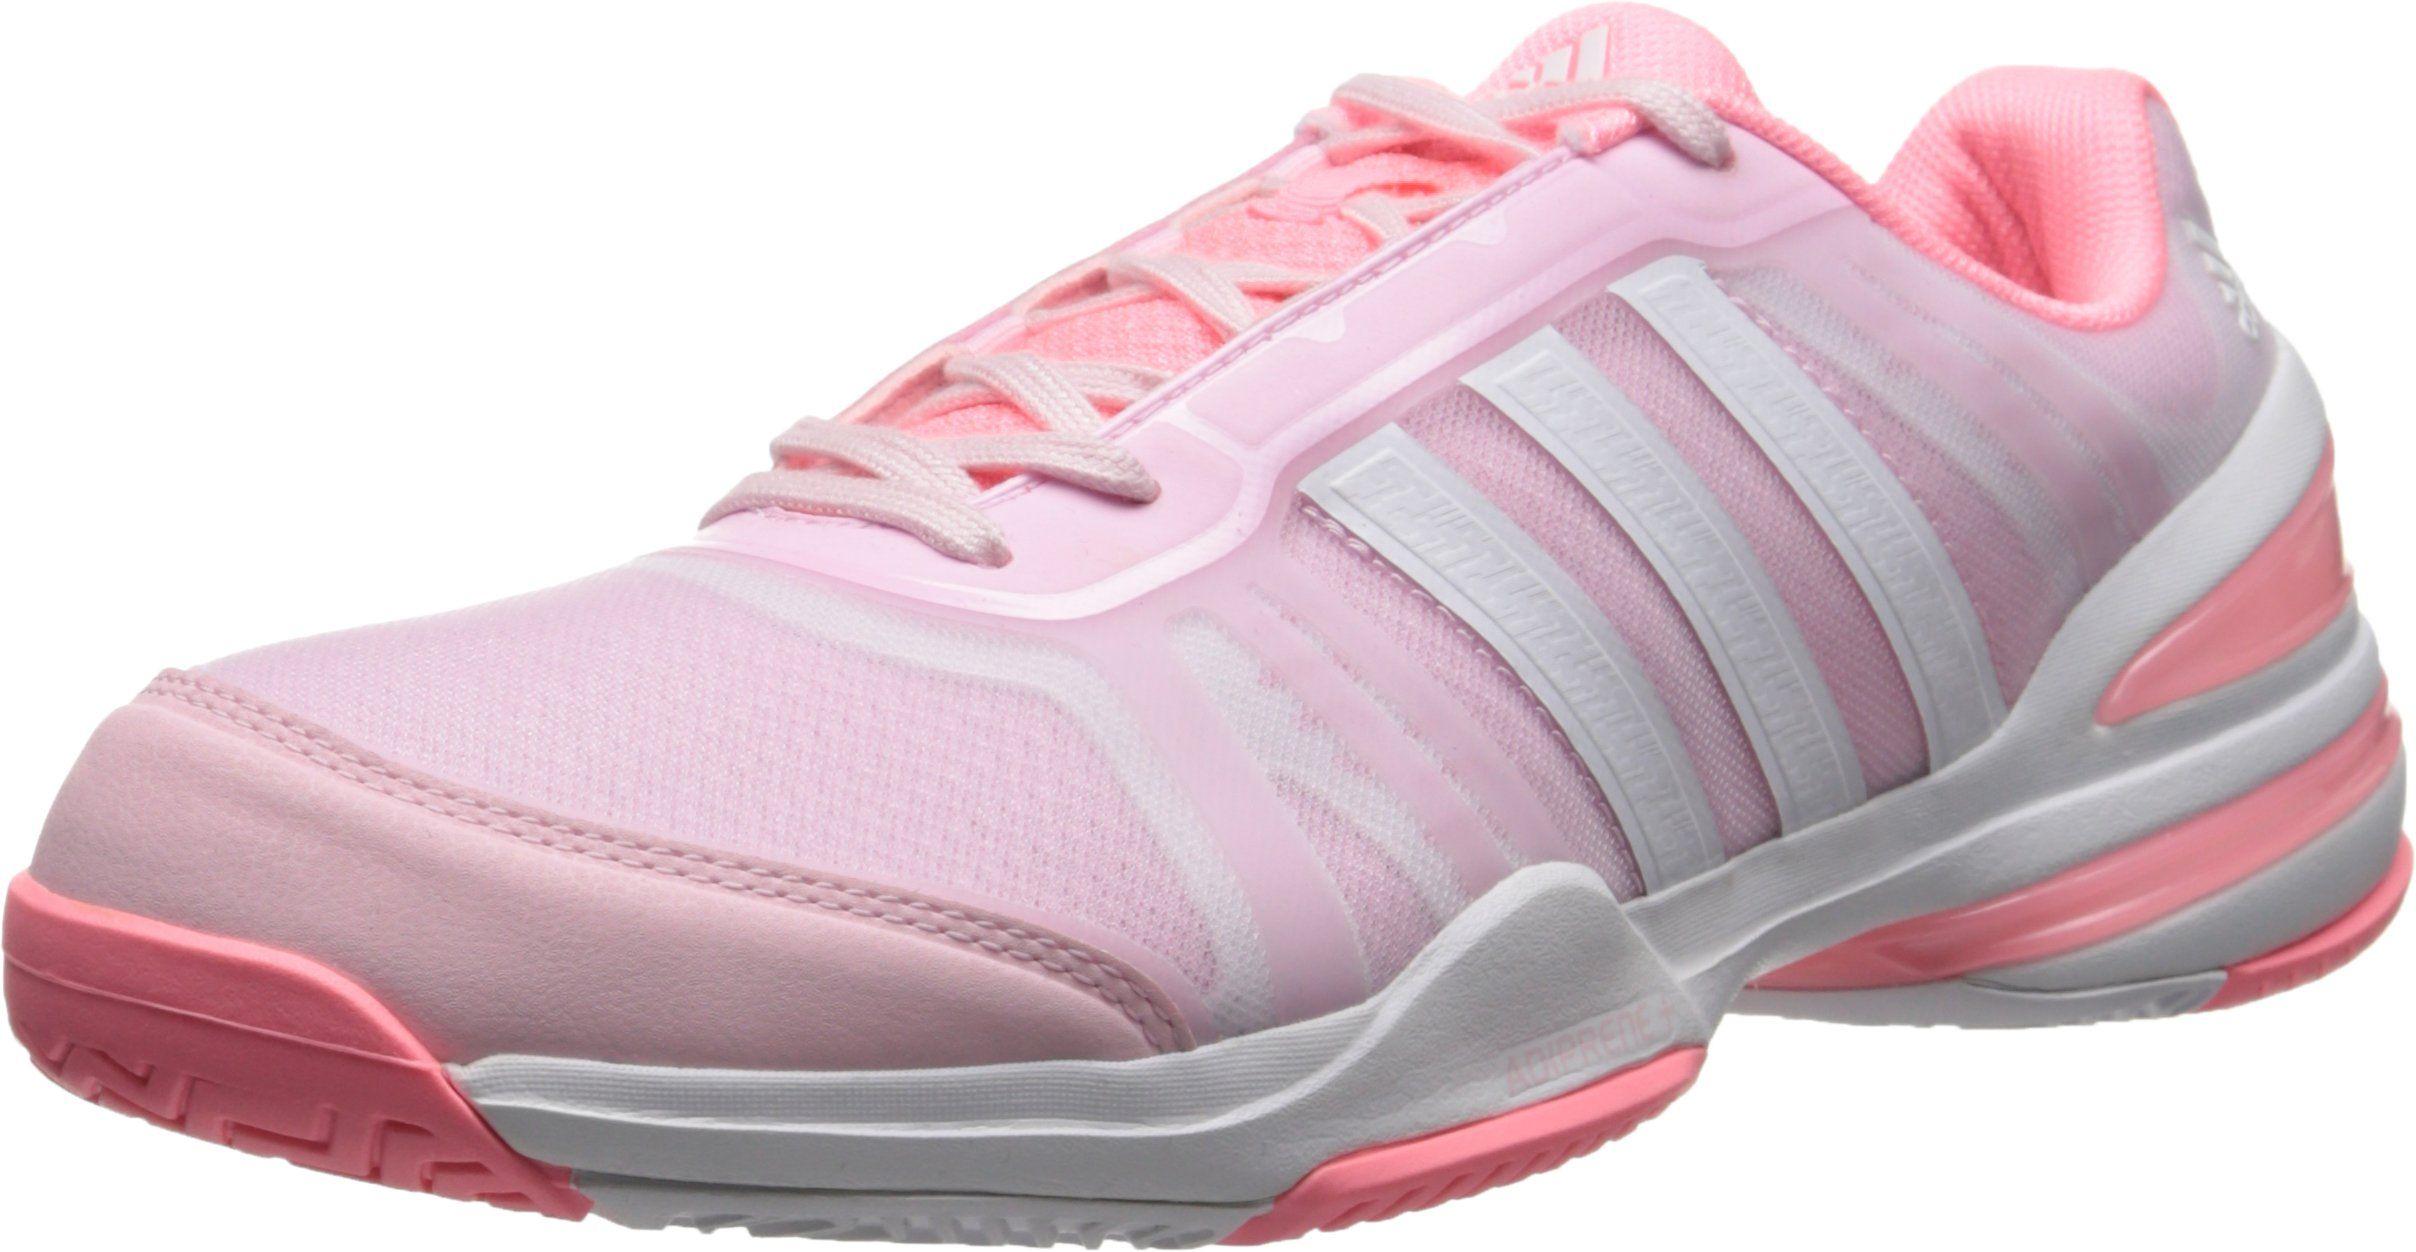 : adidas performance le cc rally comp w scarpa da tennis